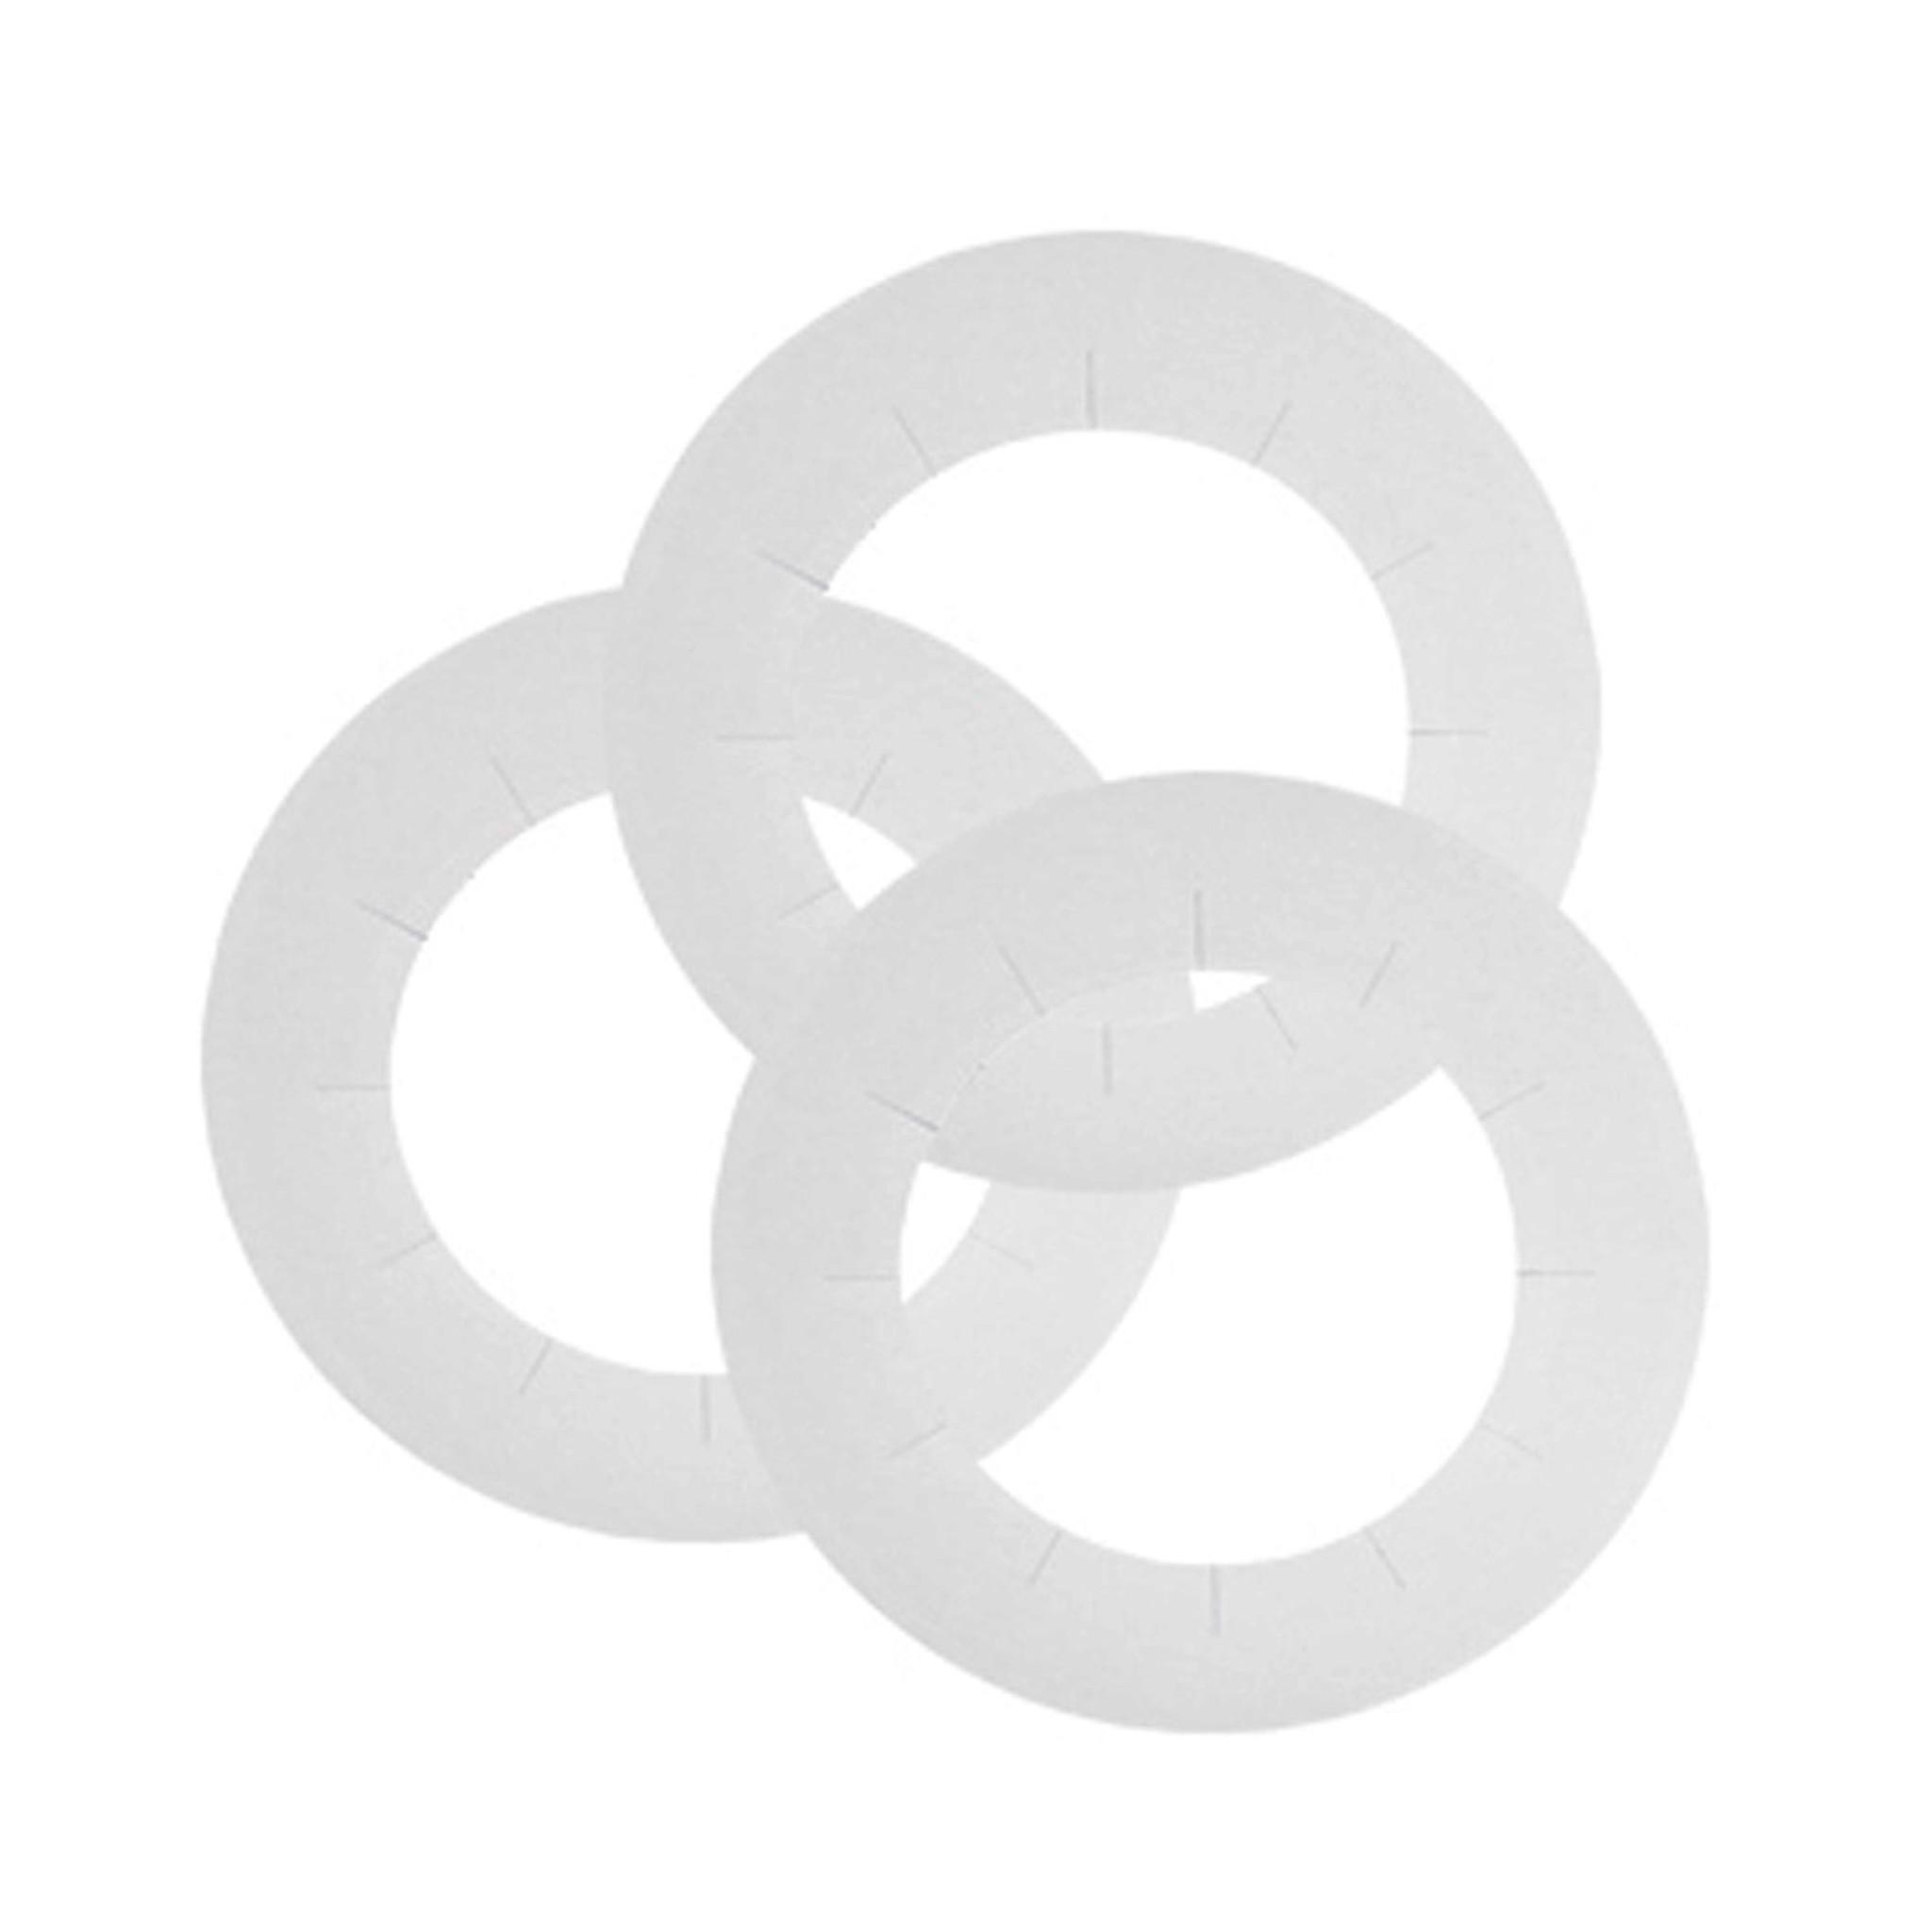 Disposable Cardboard Heater Collars (50 pcs)